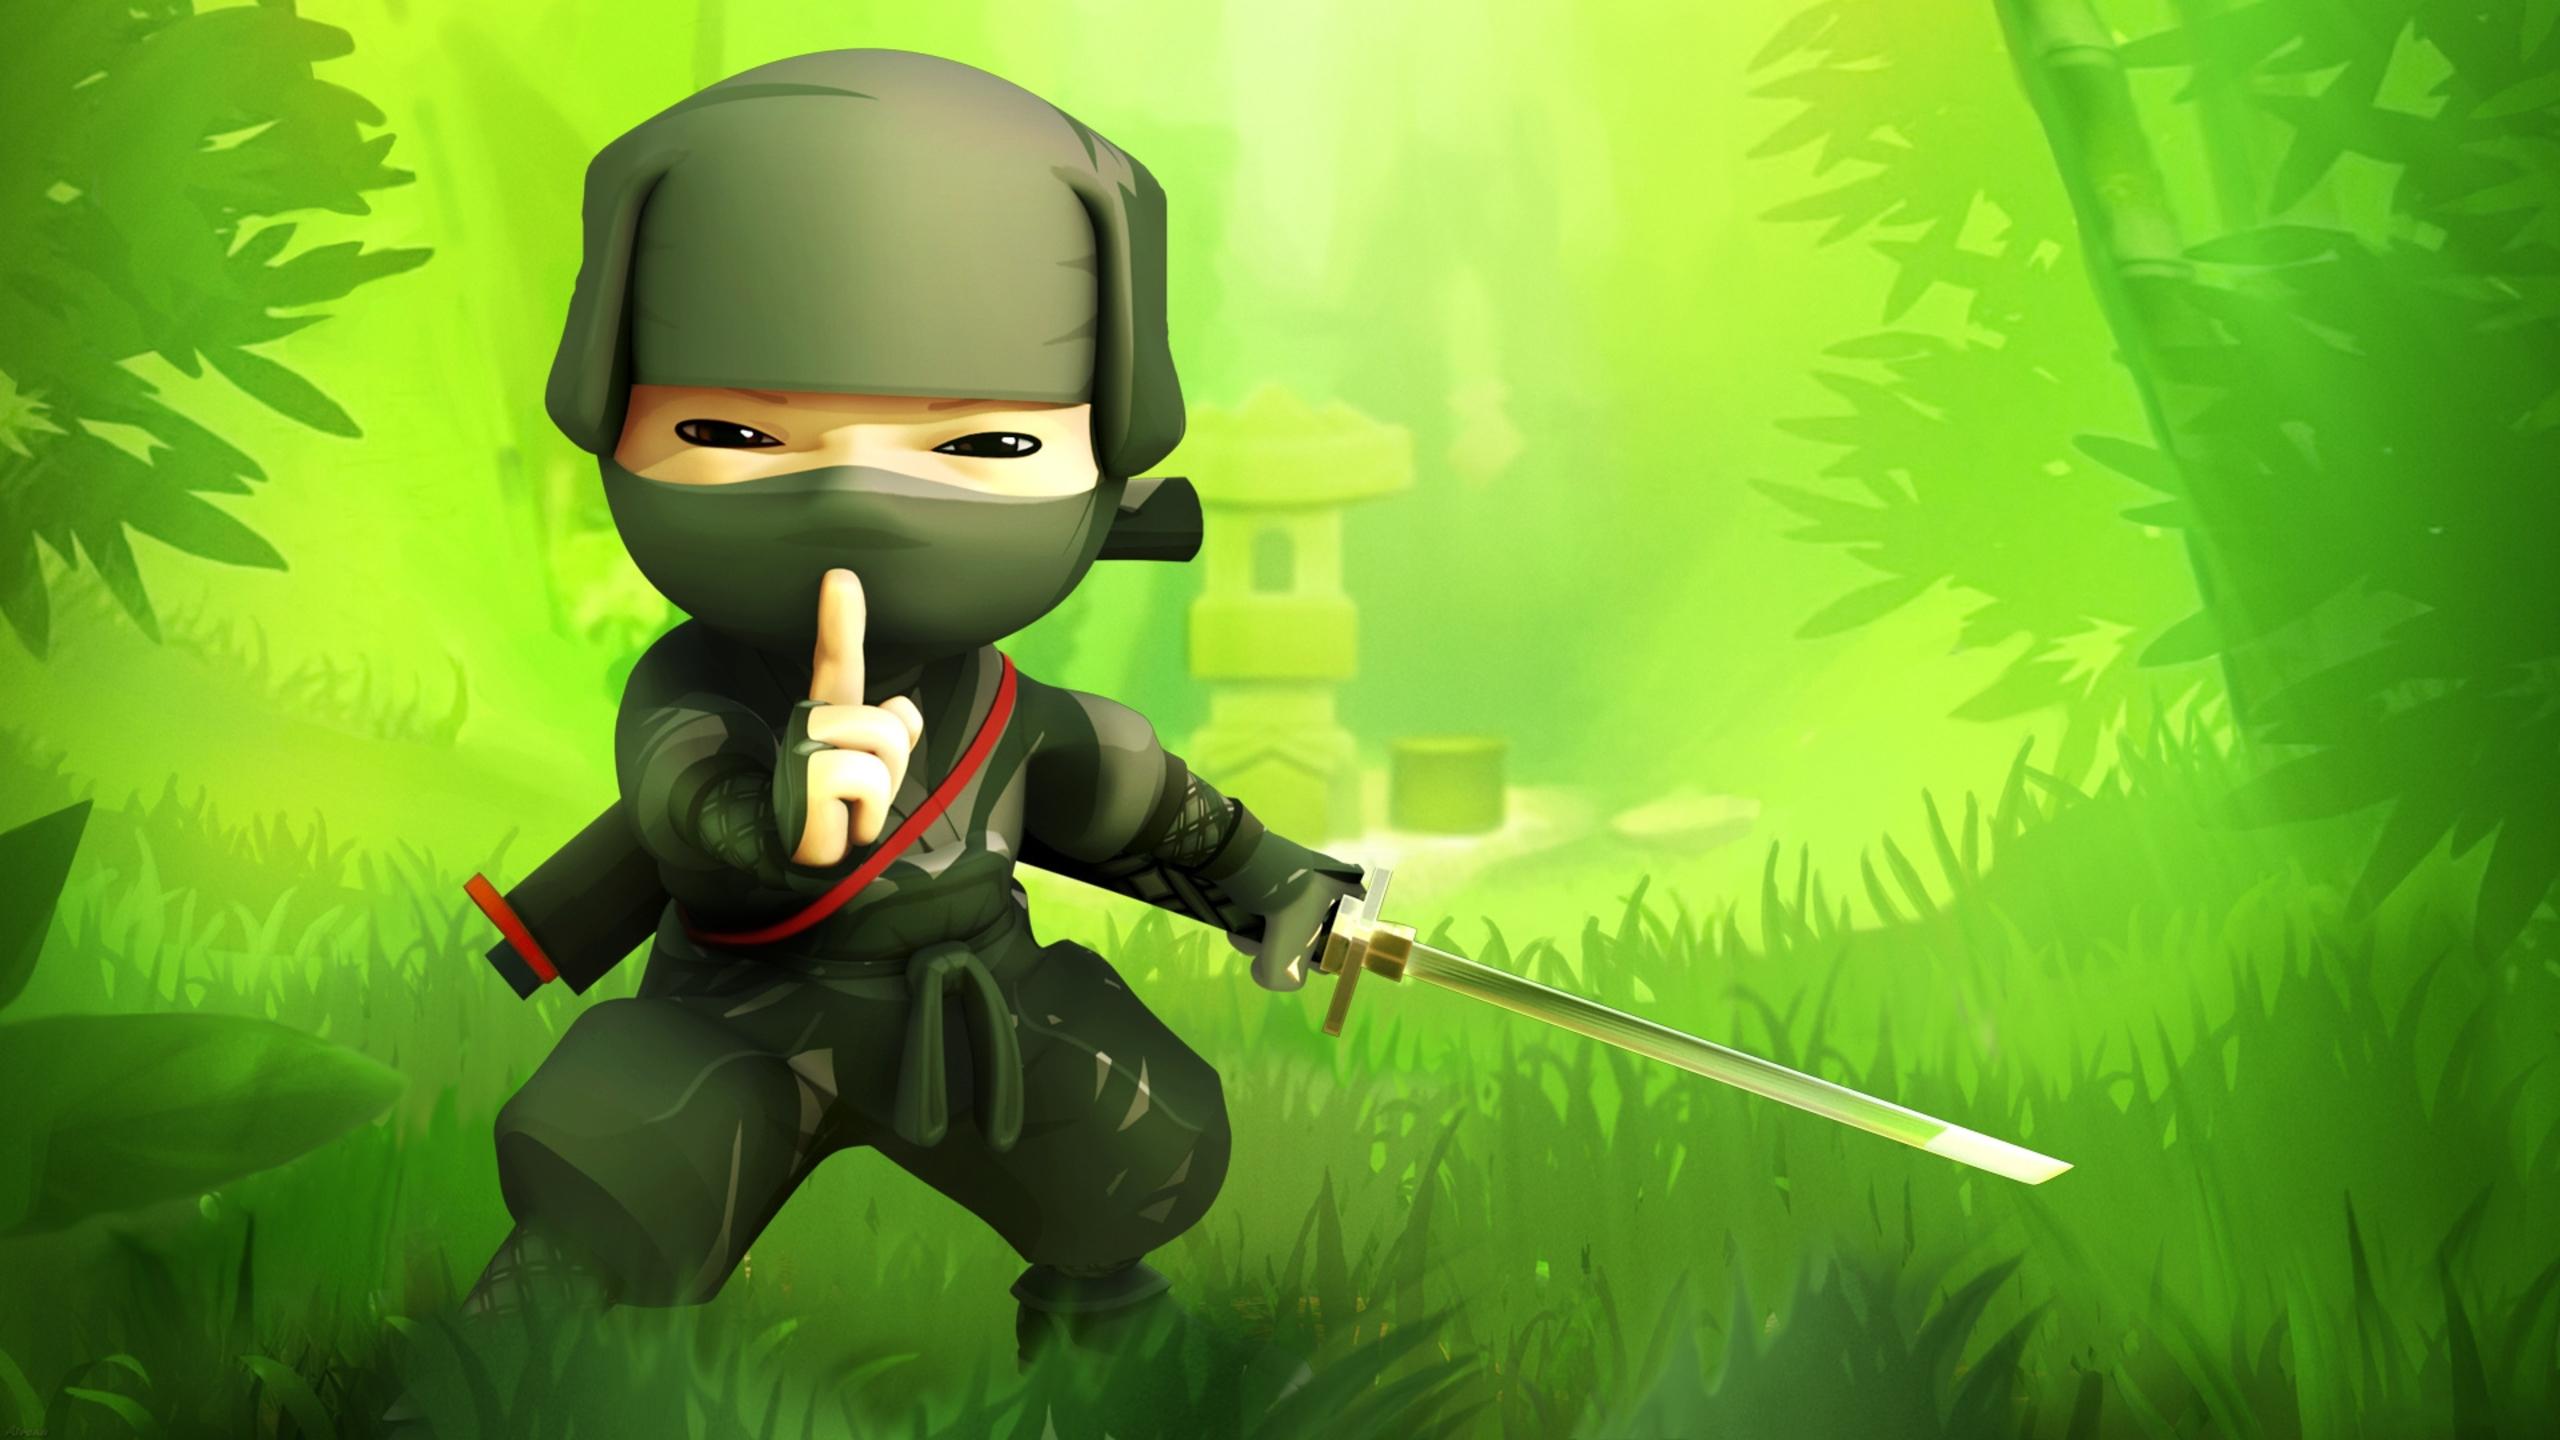 2560x1440 Cartoon Ninja 1440P Resolution HD 4k Wallpapers